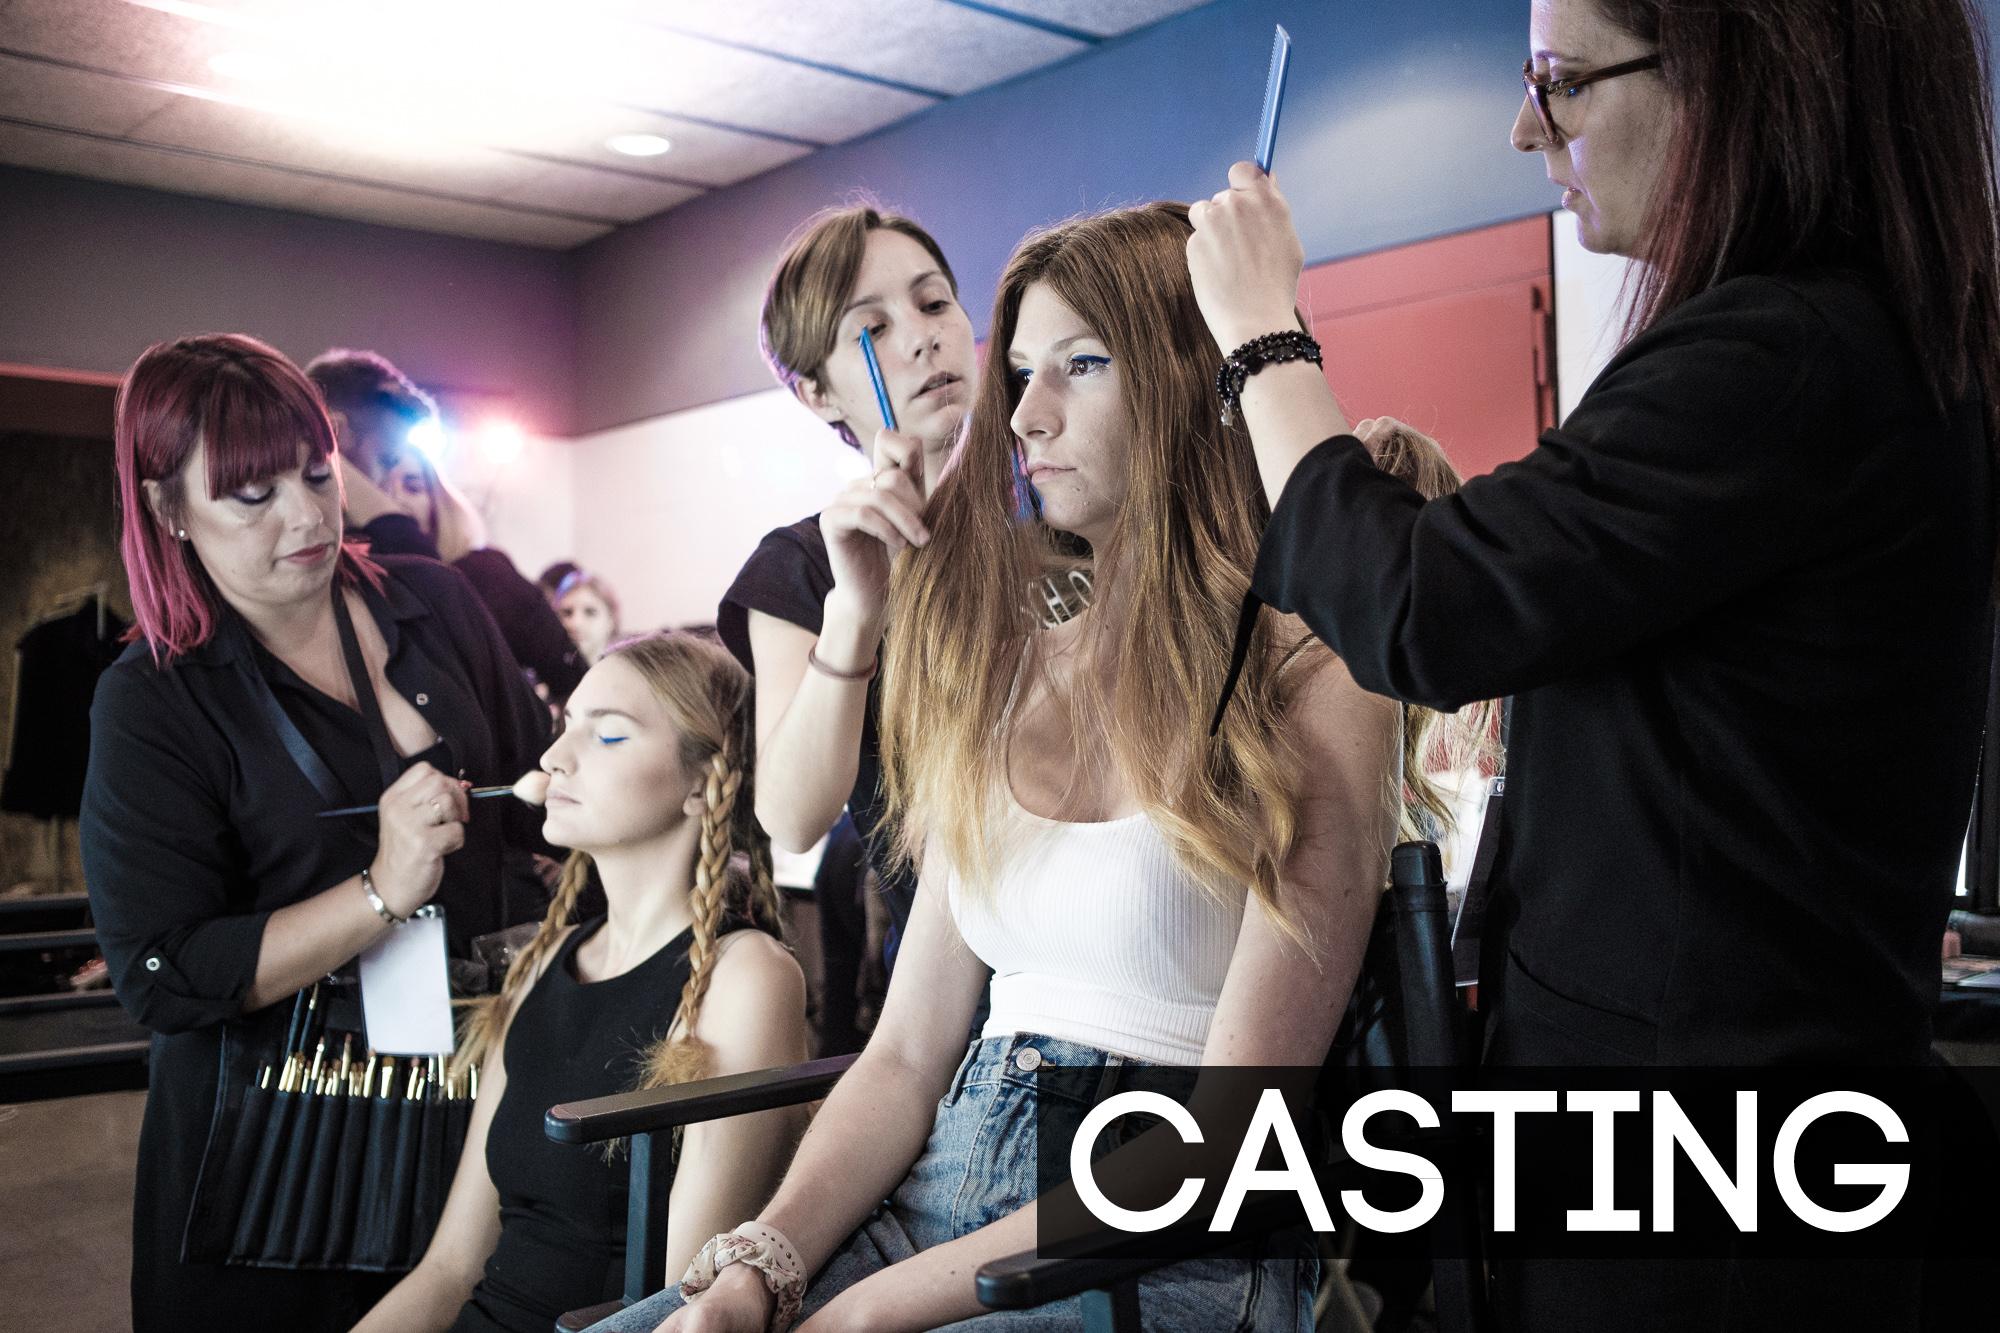 Casting_2_Altiba9_Alger_2019.jpg